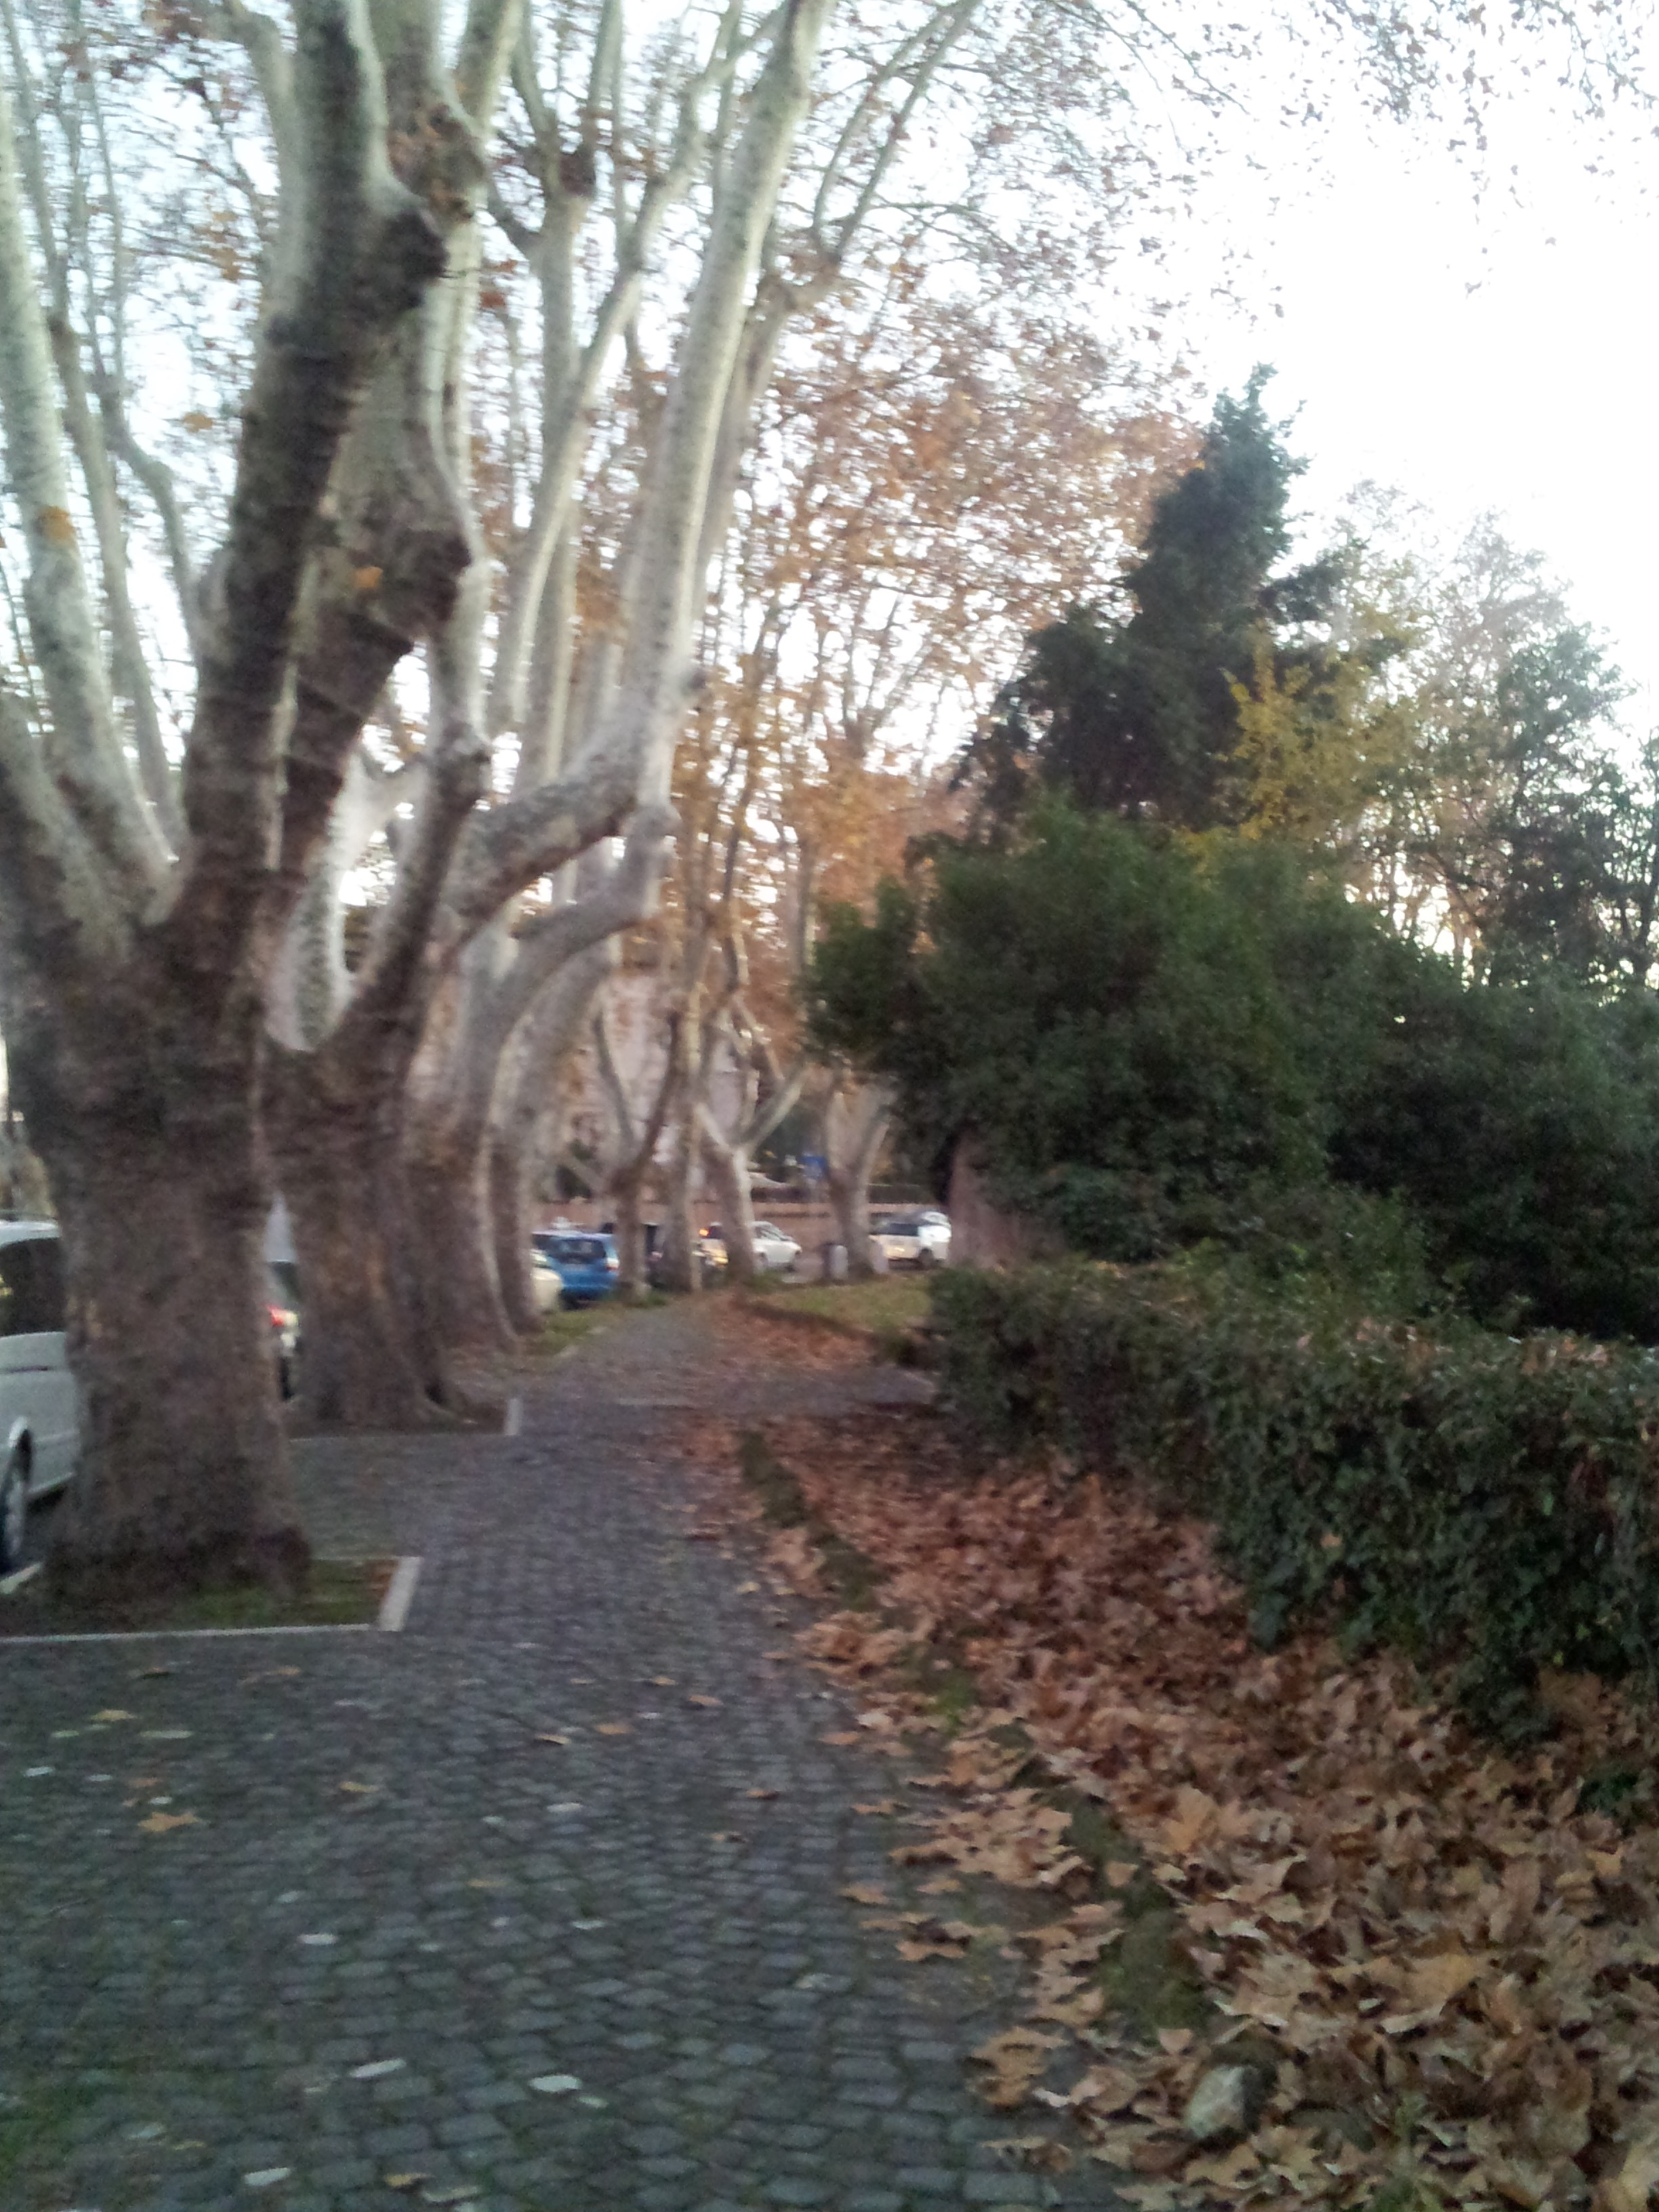 A neighborhood in Rome